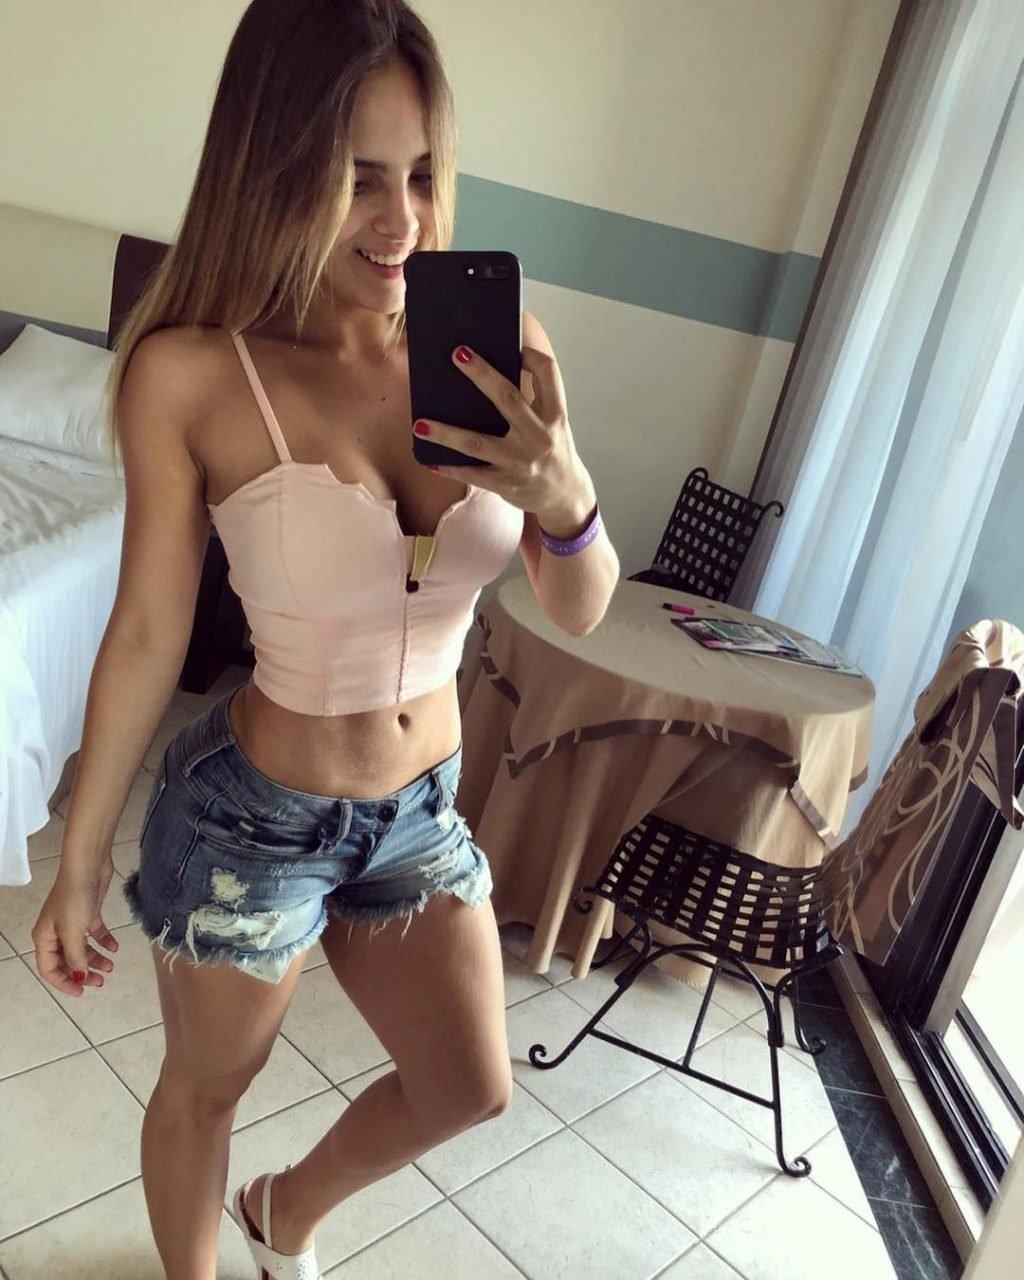 cleavage Porno Daysy Rodriguez Ferreira naked photo 2017